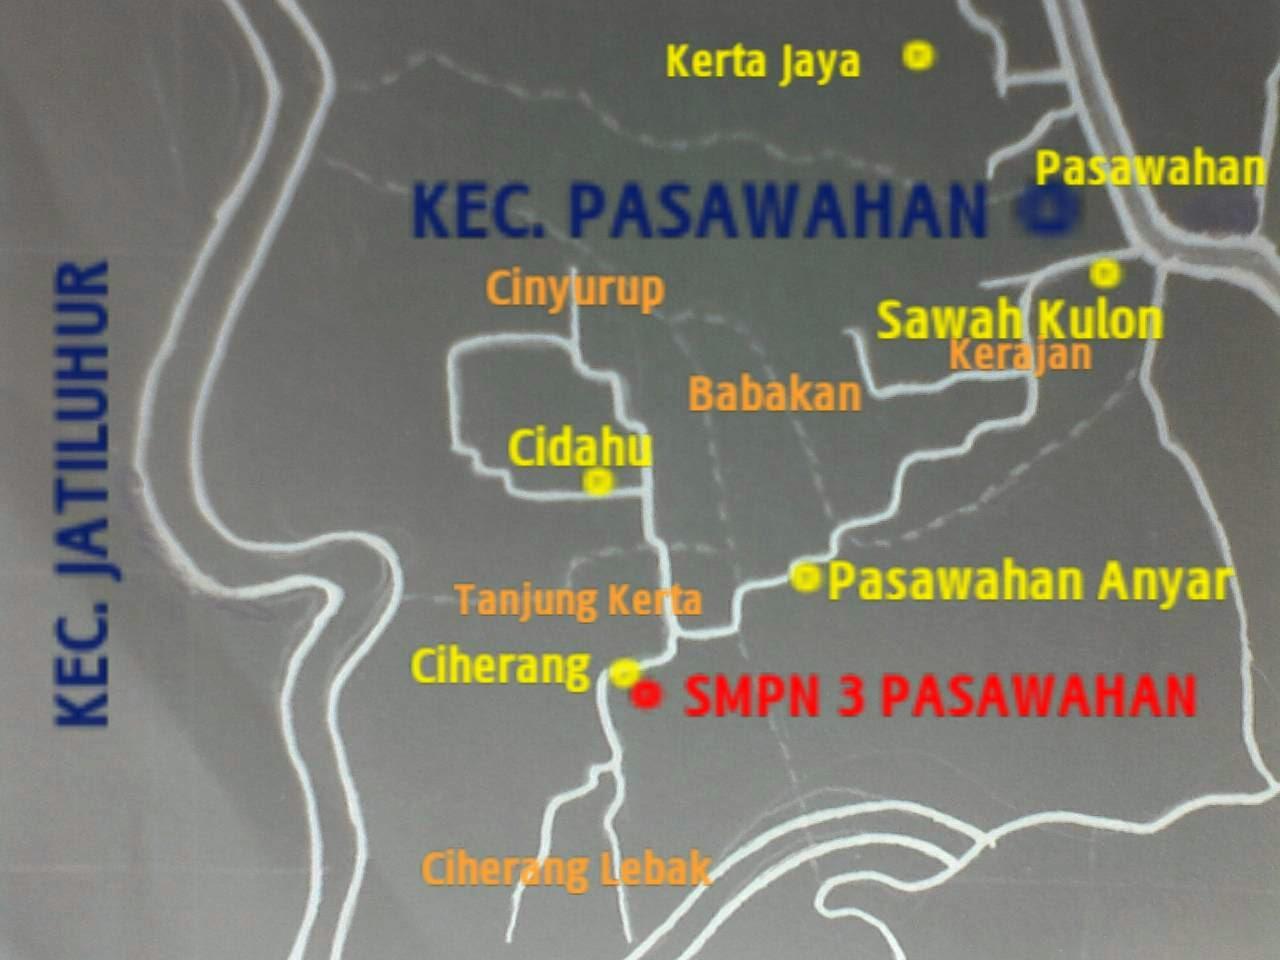 Desa Cidahu Mudah Dijangkau Dari Kota Purwakarta